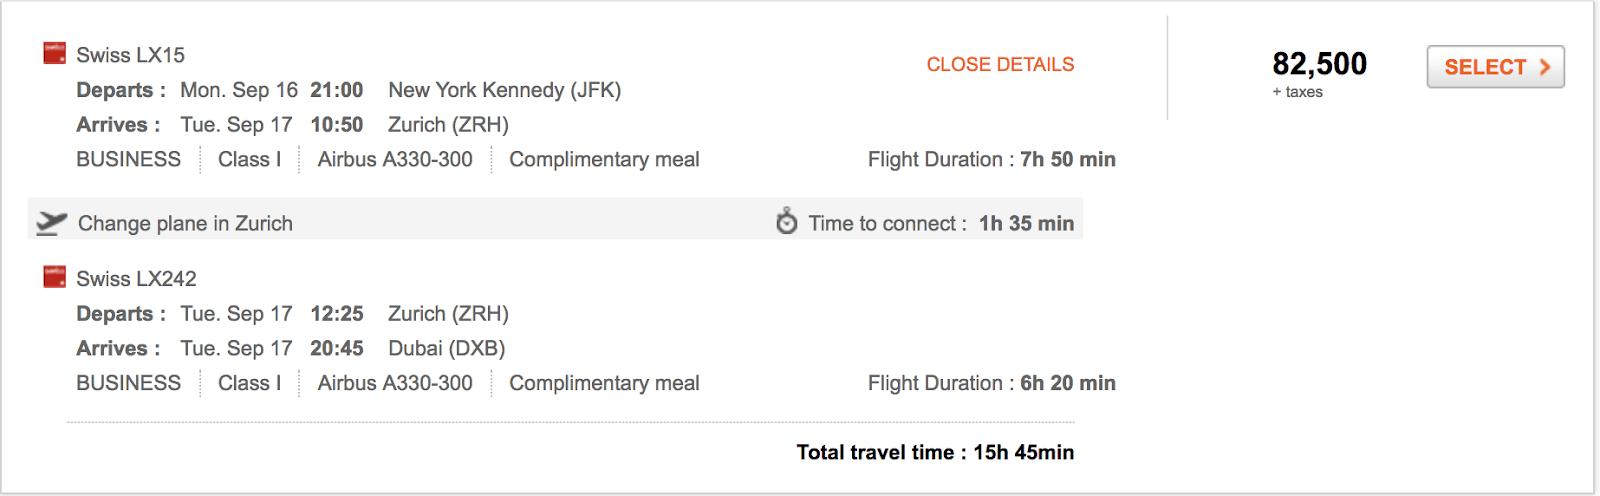 SWISS to Dubai with Aeroplan